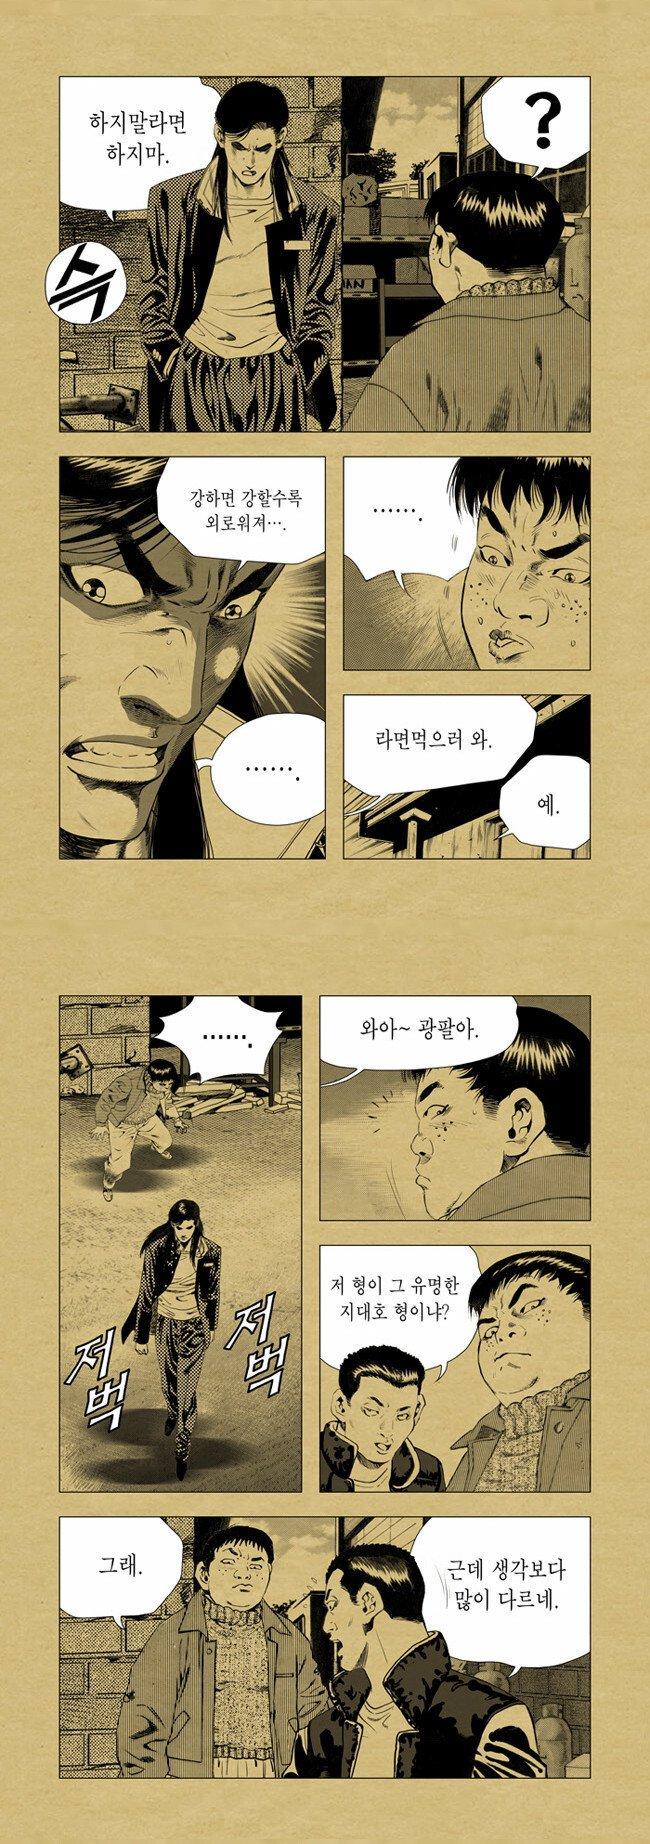 2.jpg 김성모 작품의 몰입도가 대단한 이유